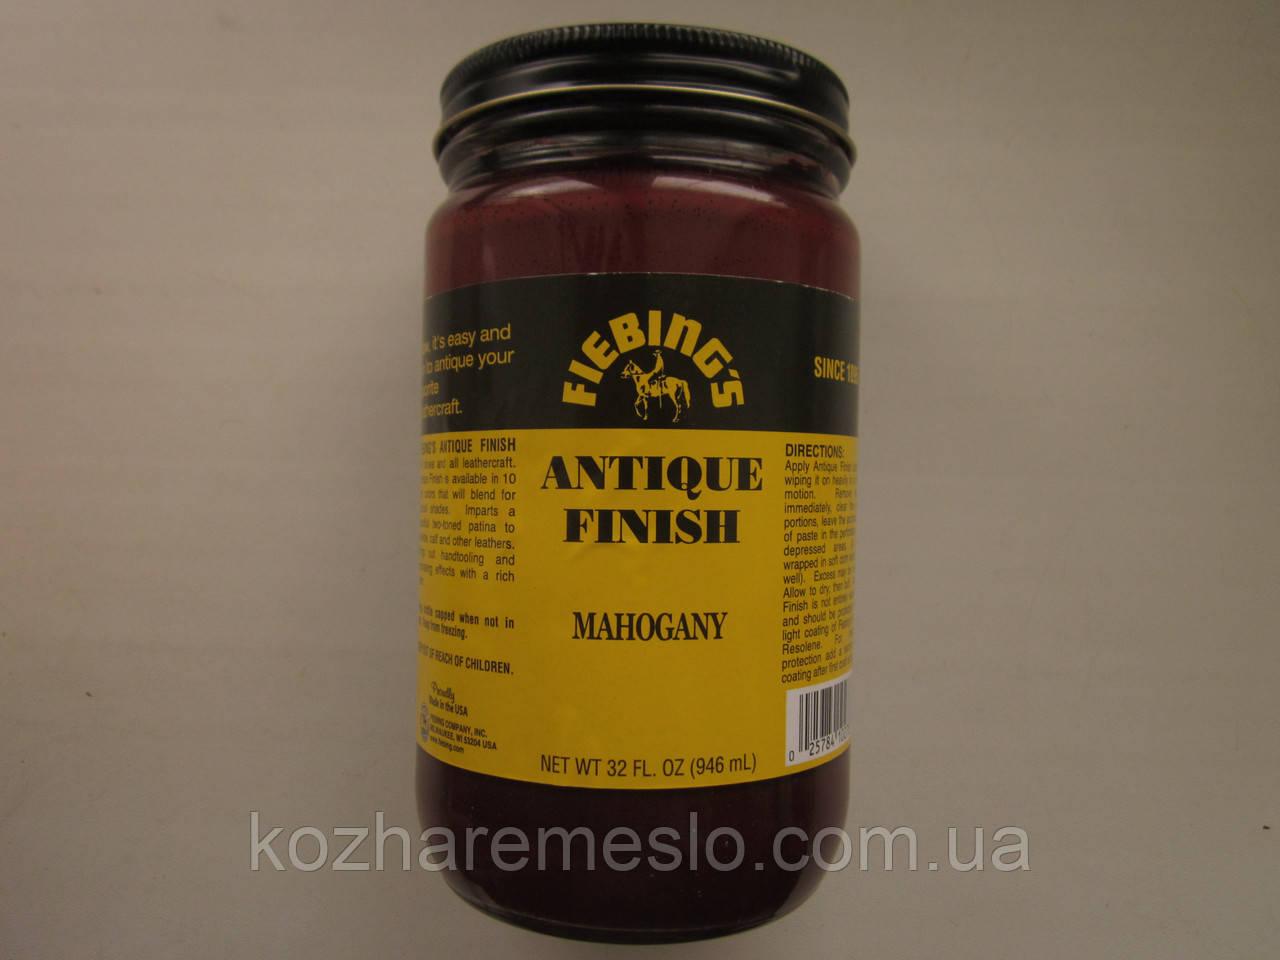 Антик - финиш FIEBING'S для кожи 50 гр mahogany (красное дерево) (не фирменная упаковка)